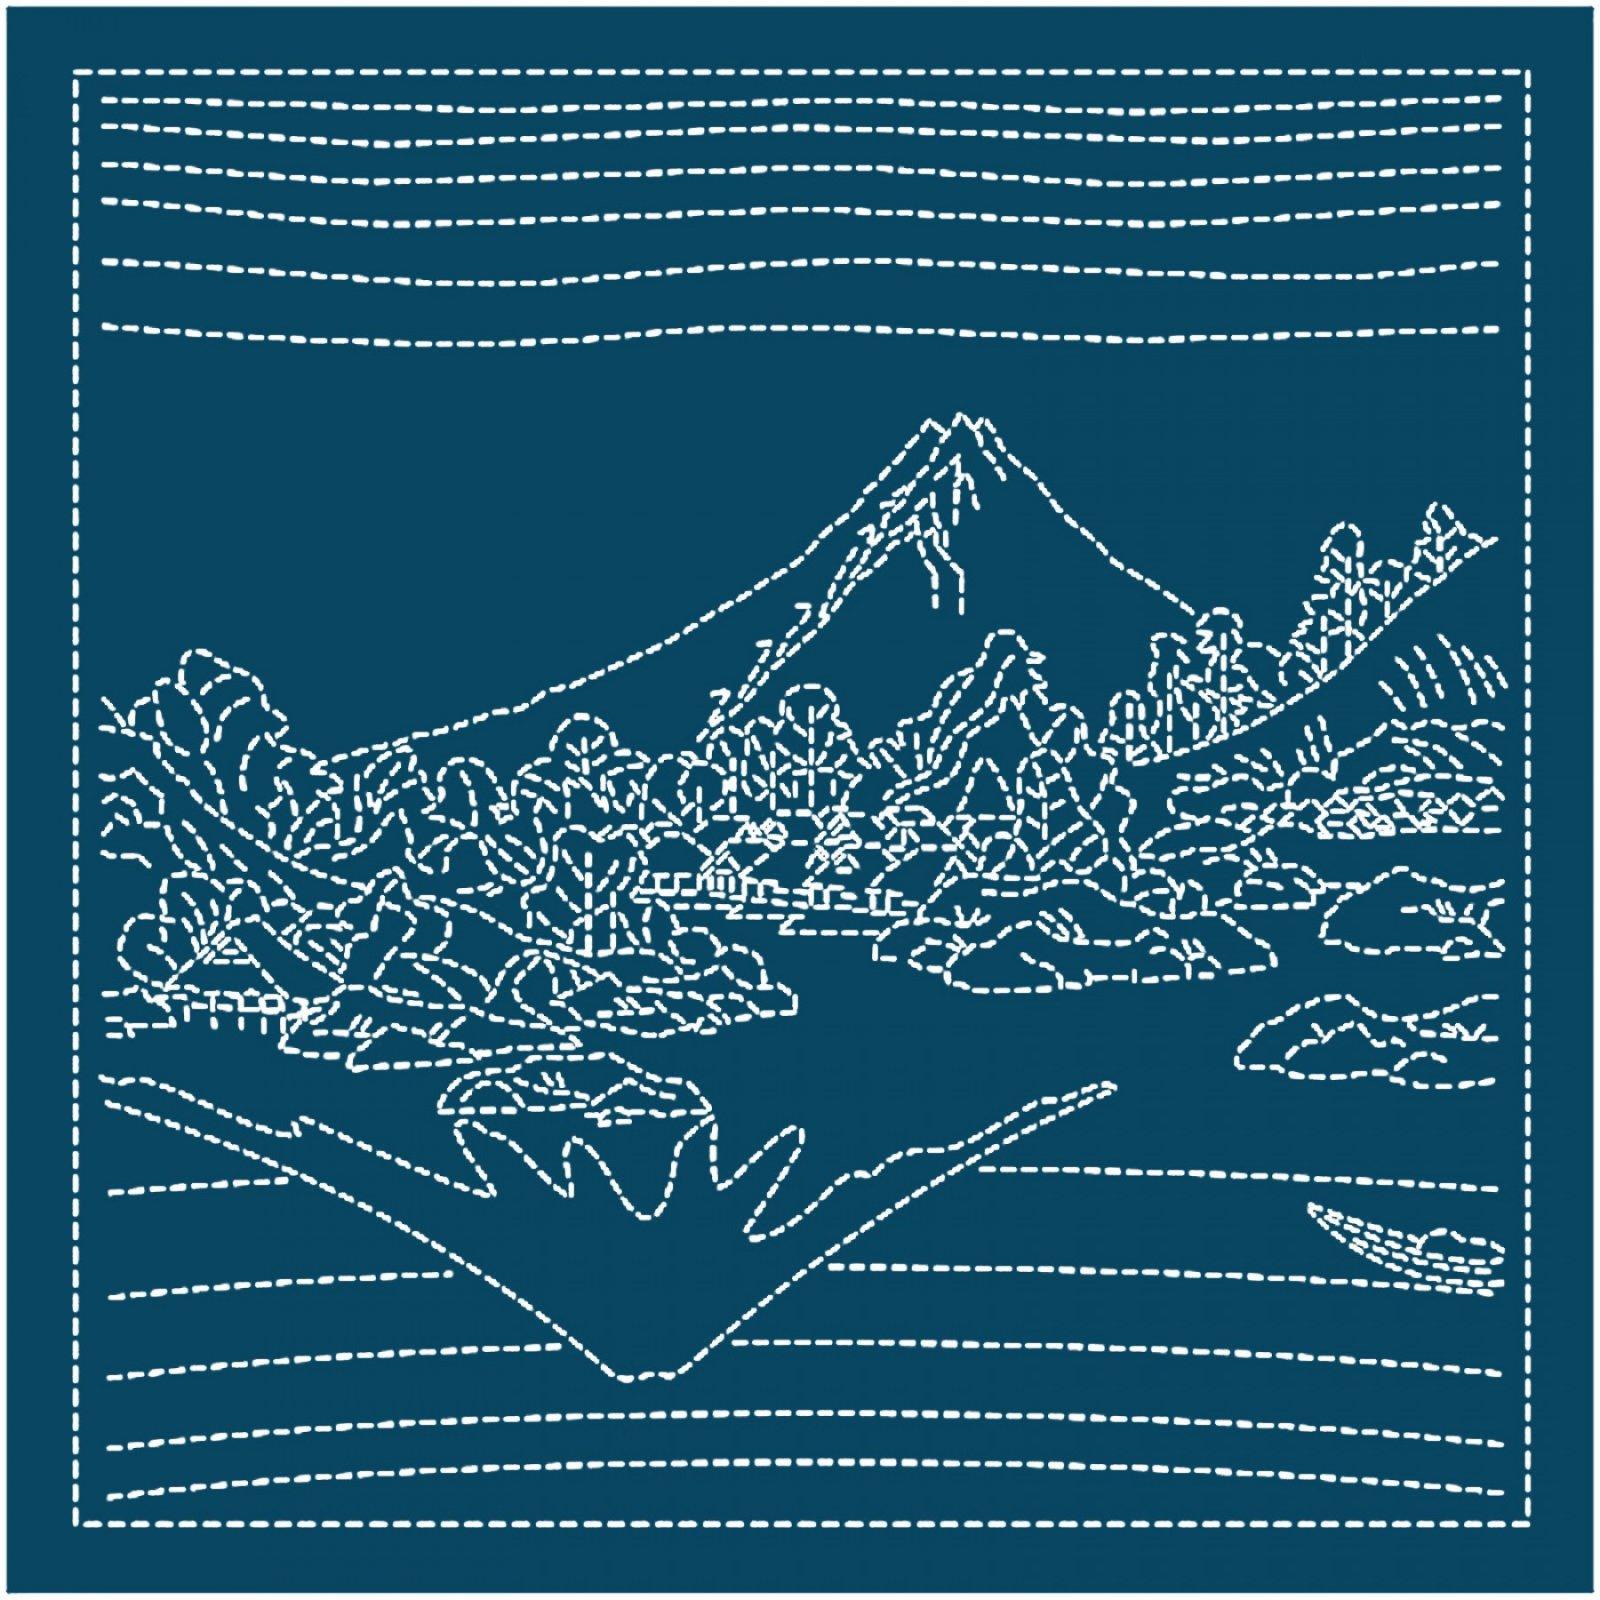 Hana Fukin Mt Fuji Sashiko Sampler navy